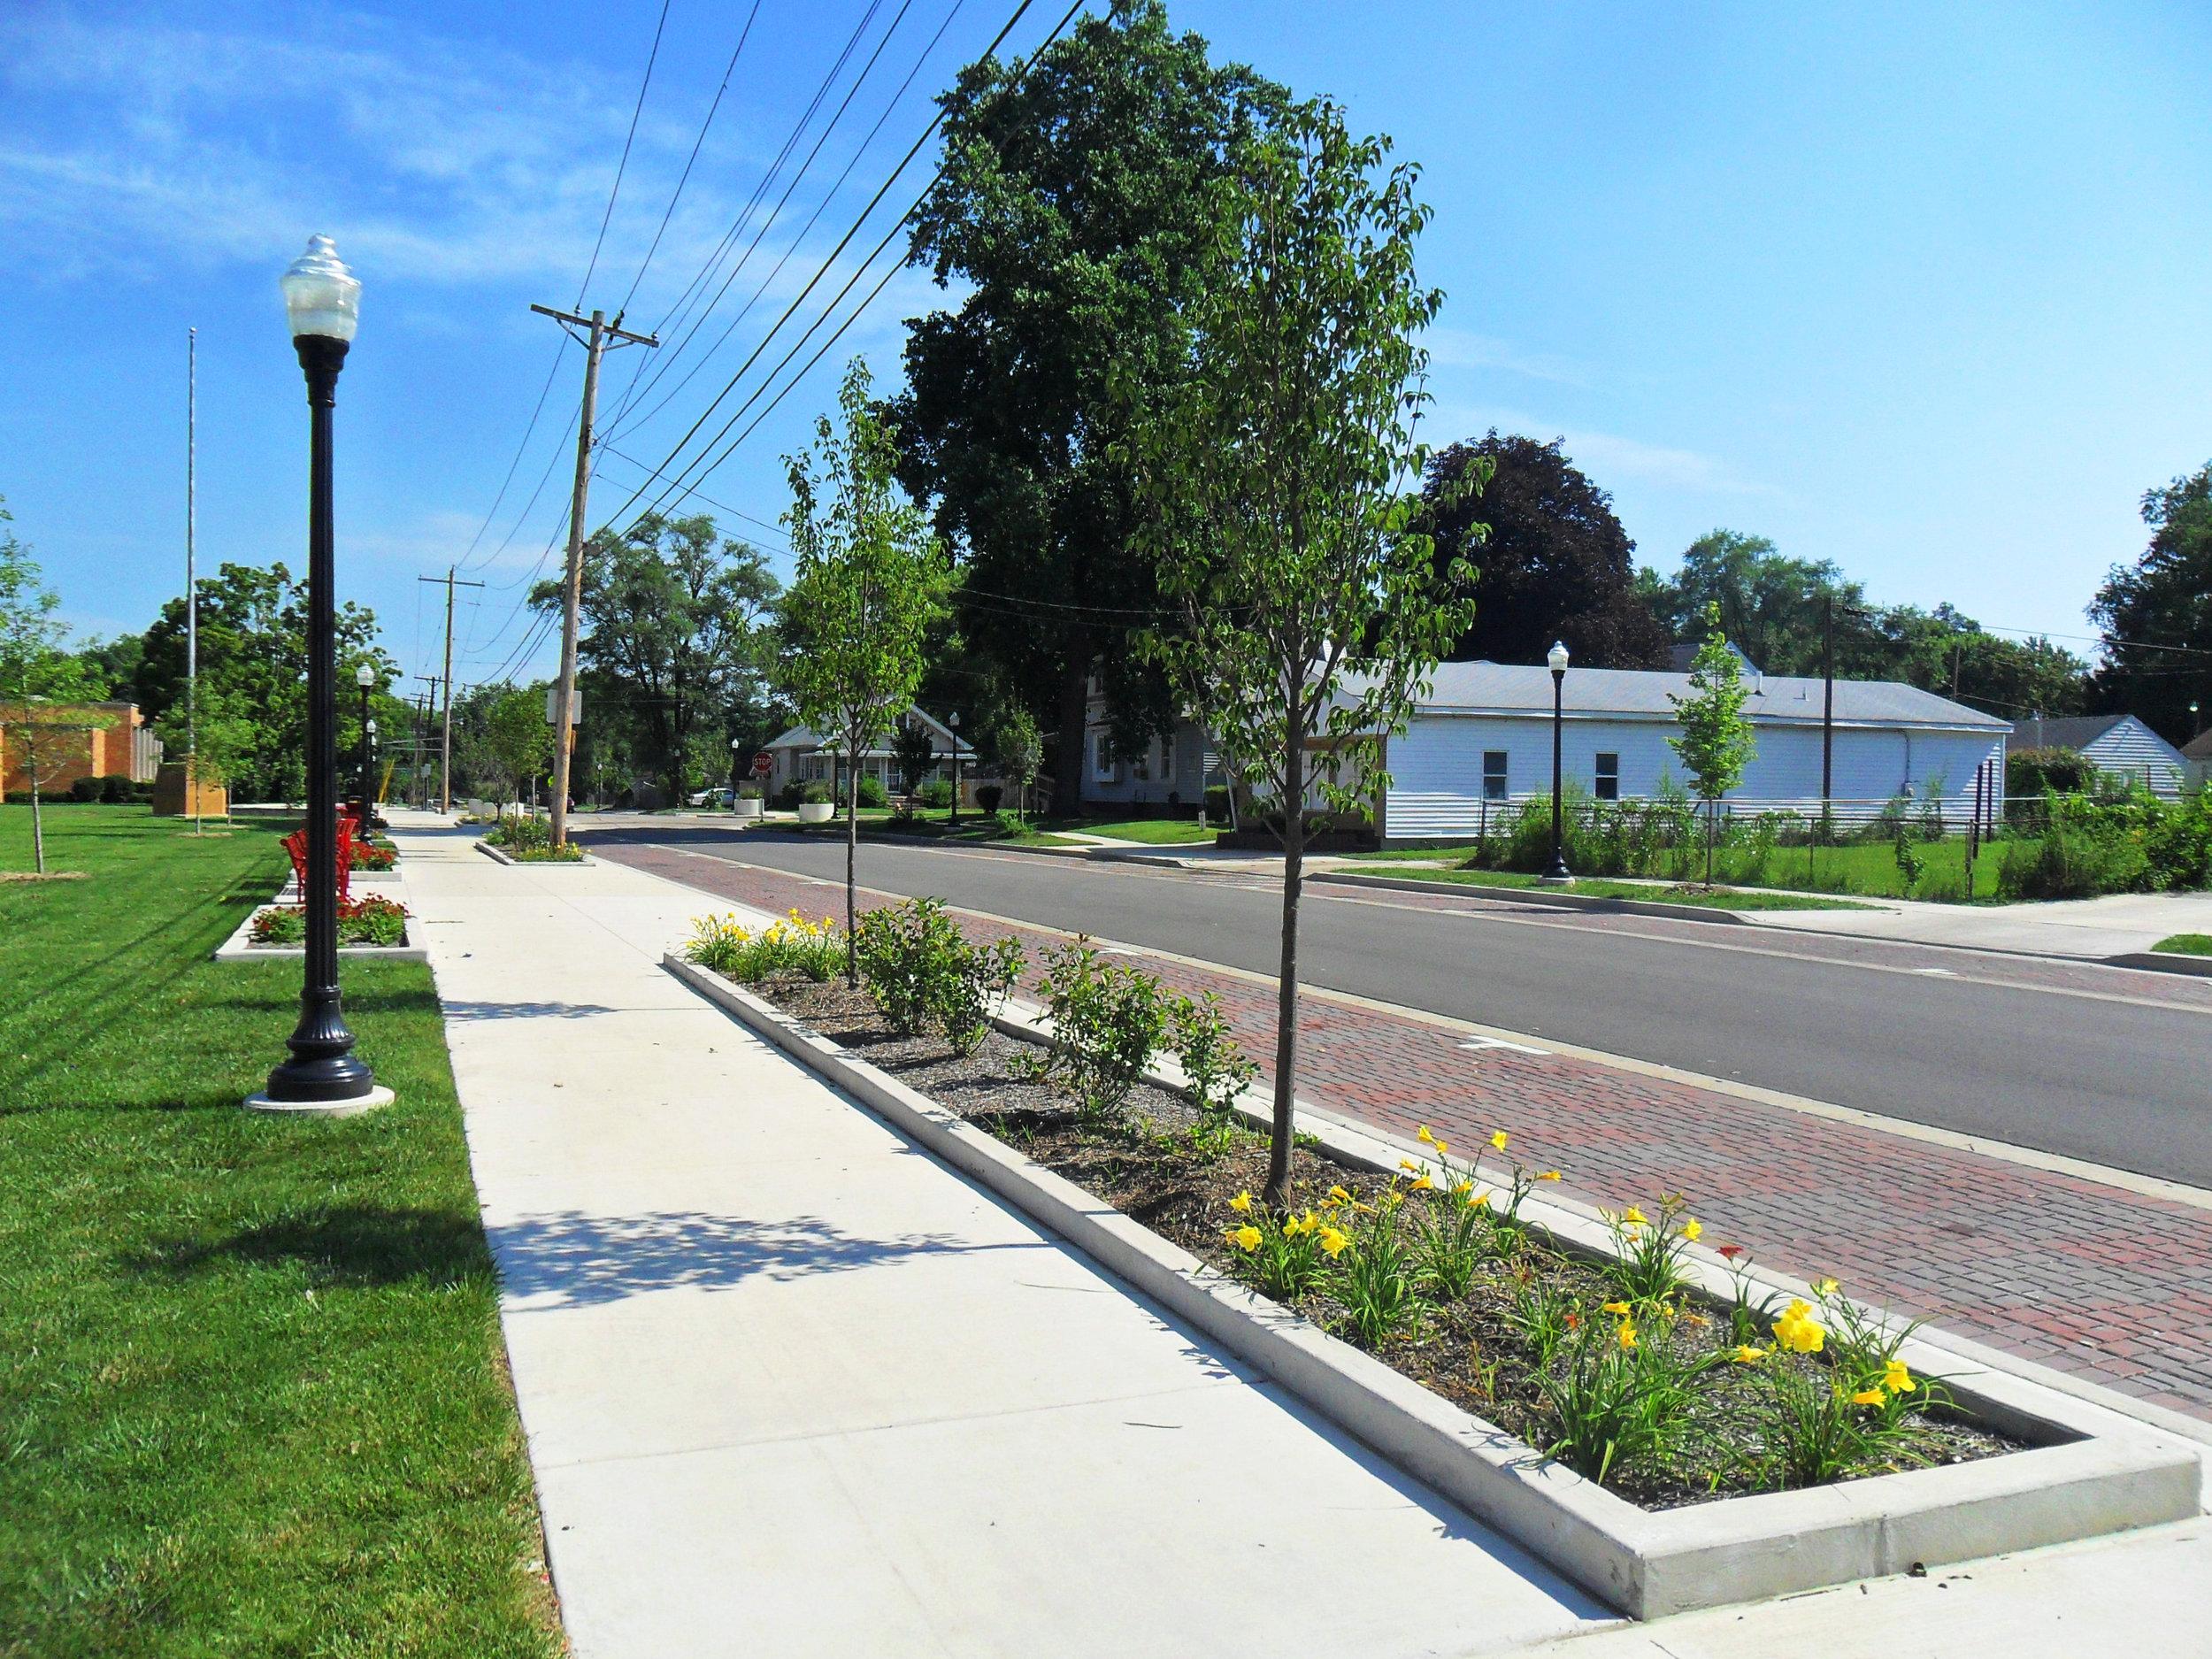 Folkers Avenue